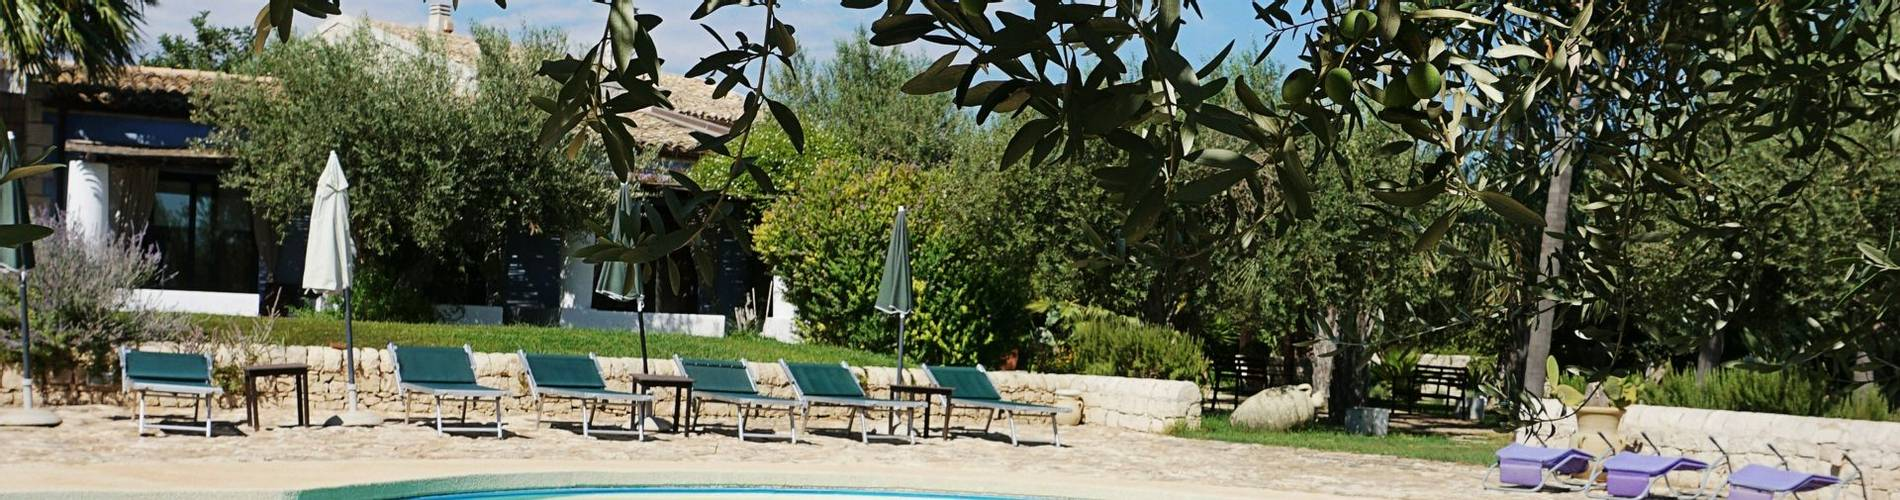 Cambiocavallo, Sicily, Italy (11).jpg